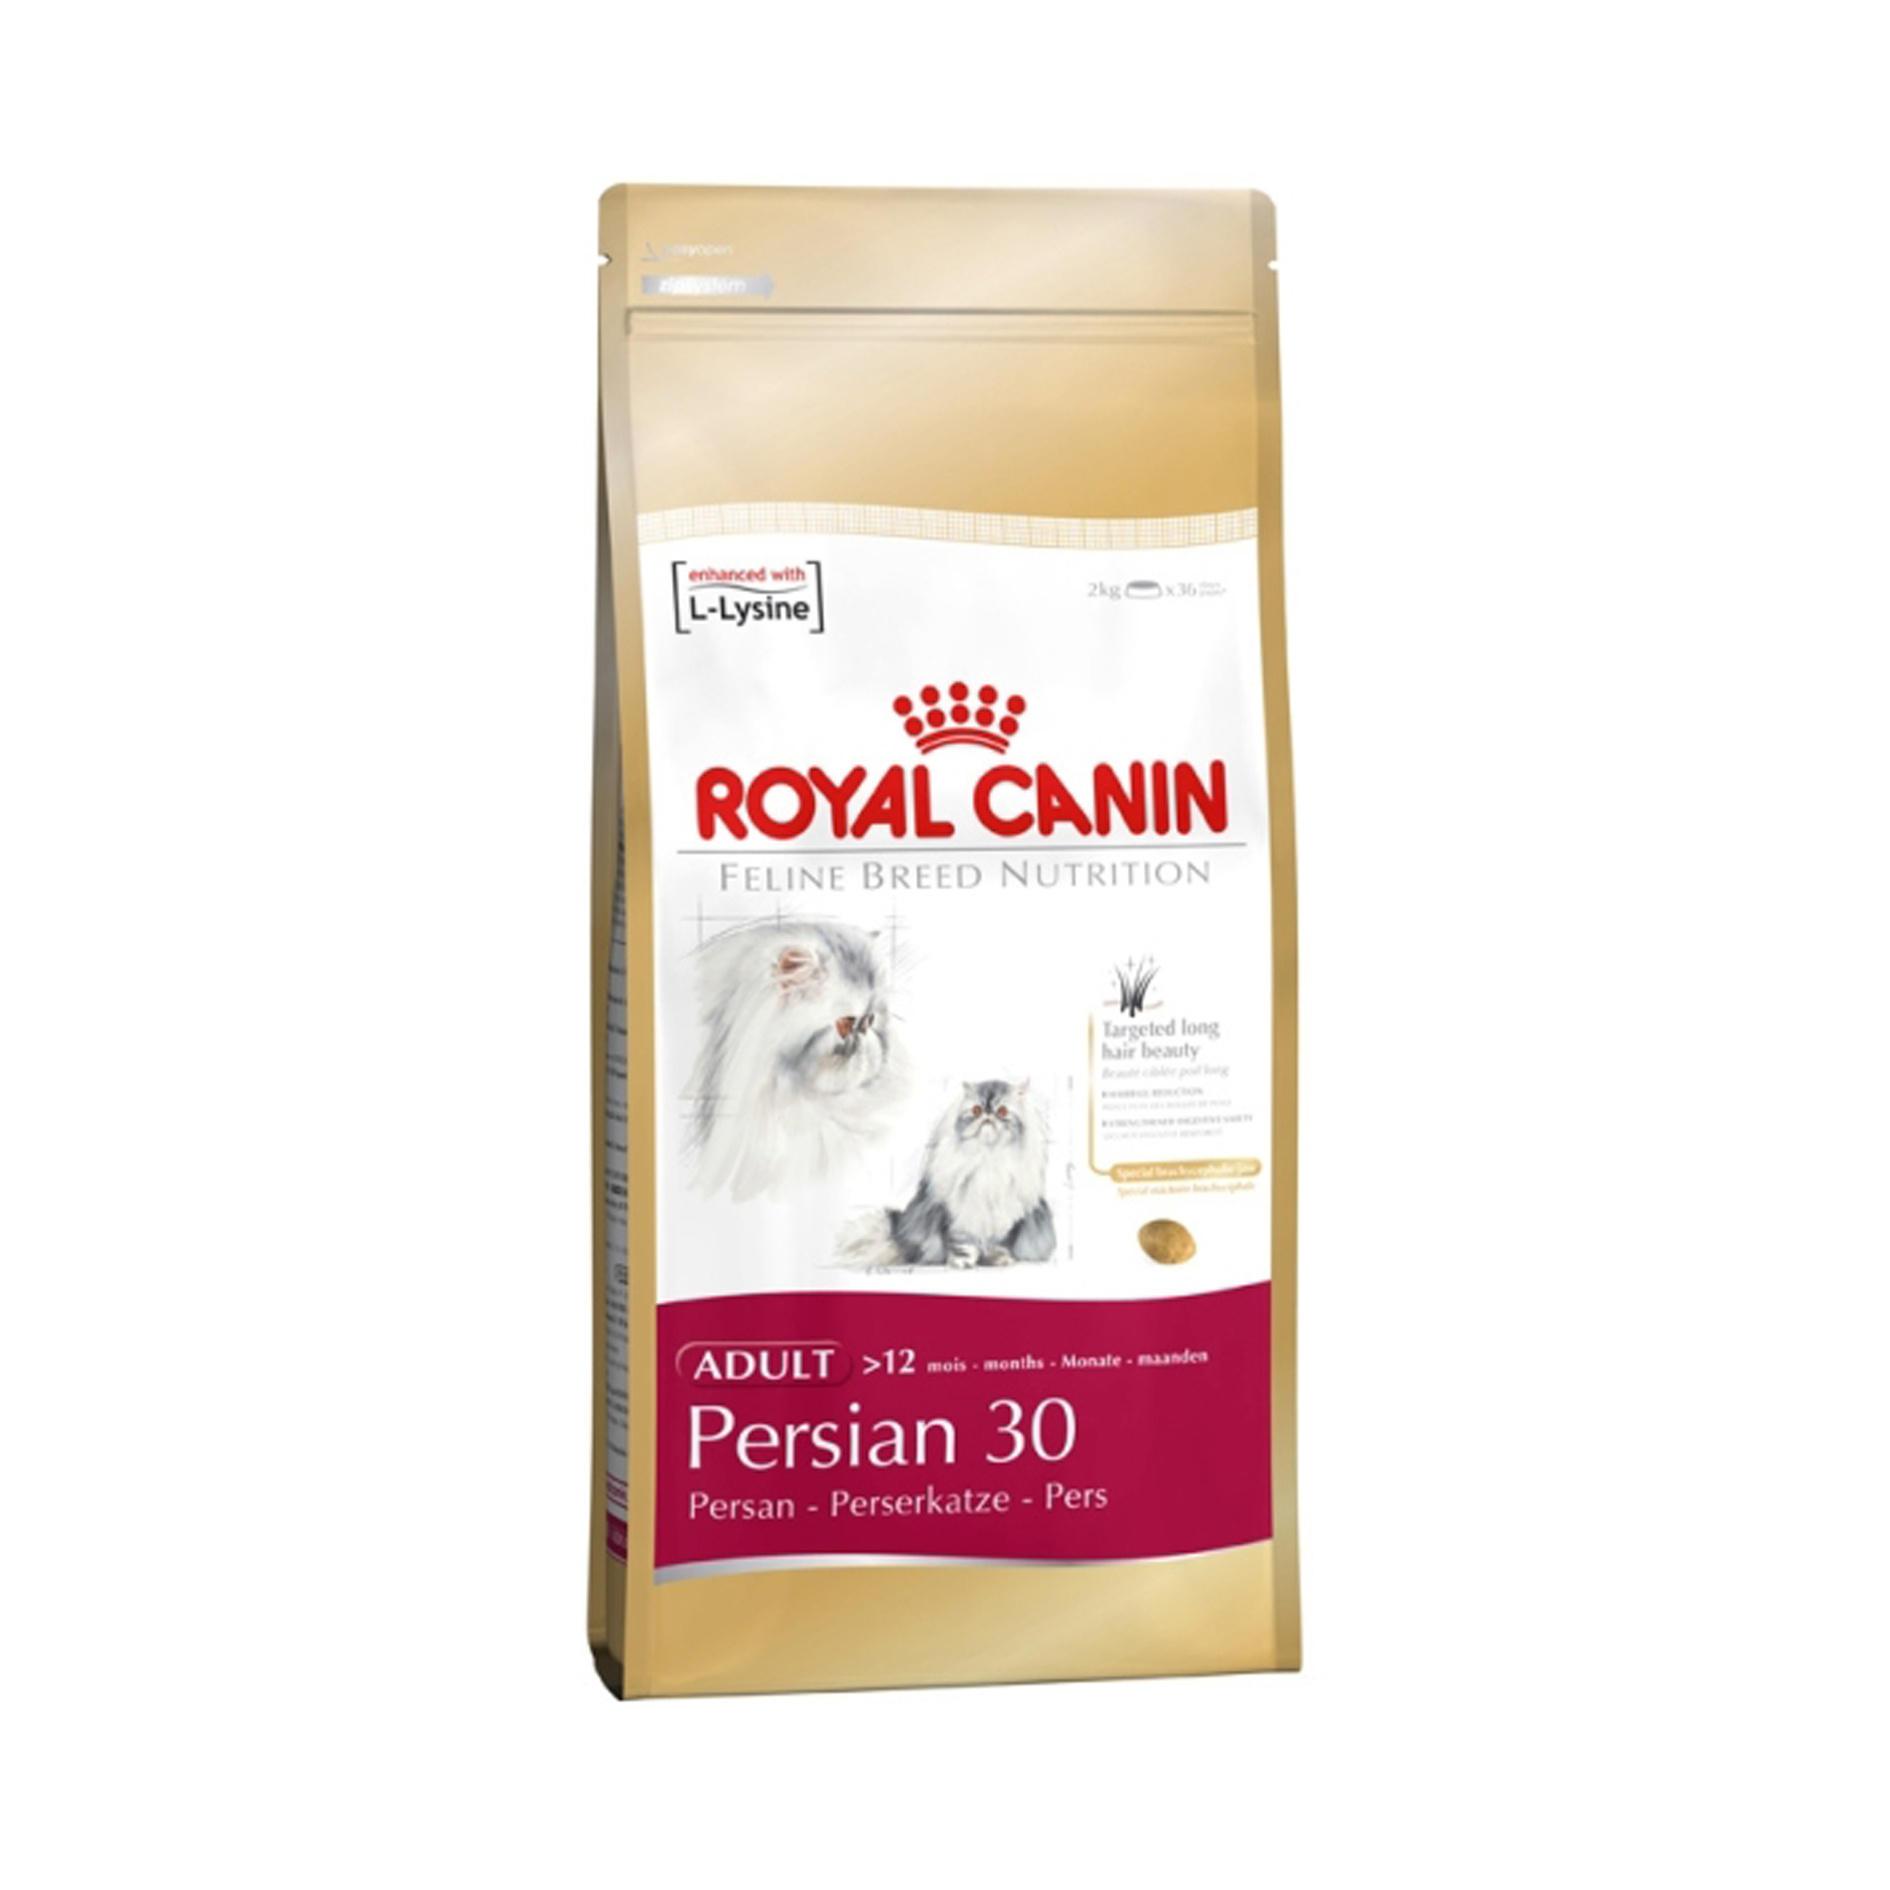 Royal Canin Feline Breed Nutrition Persian Adult 30